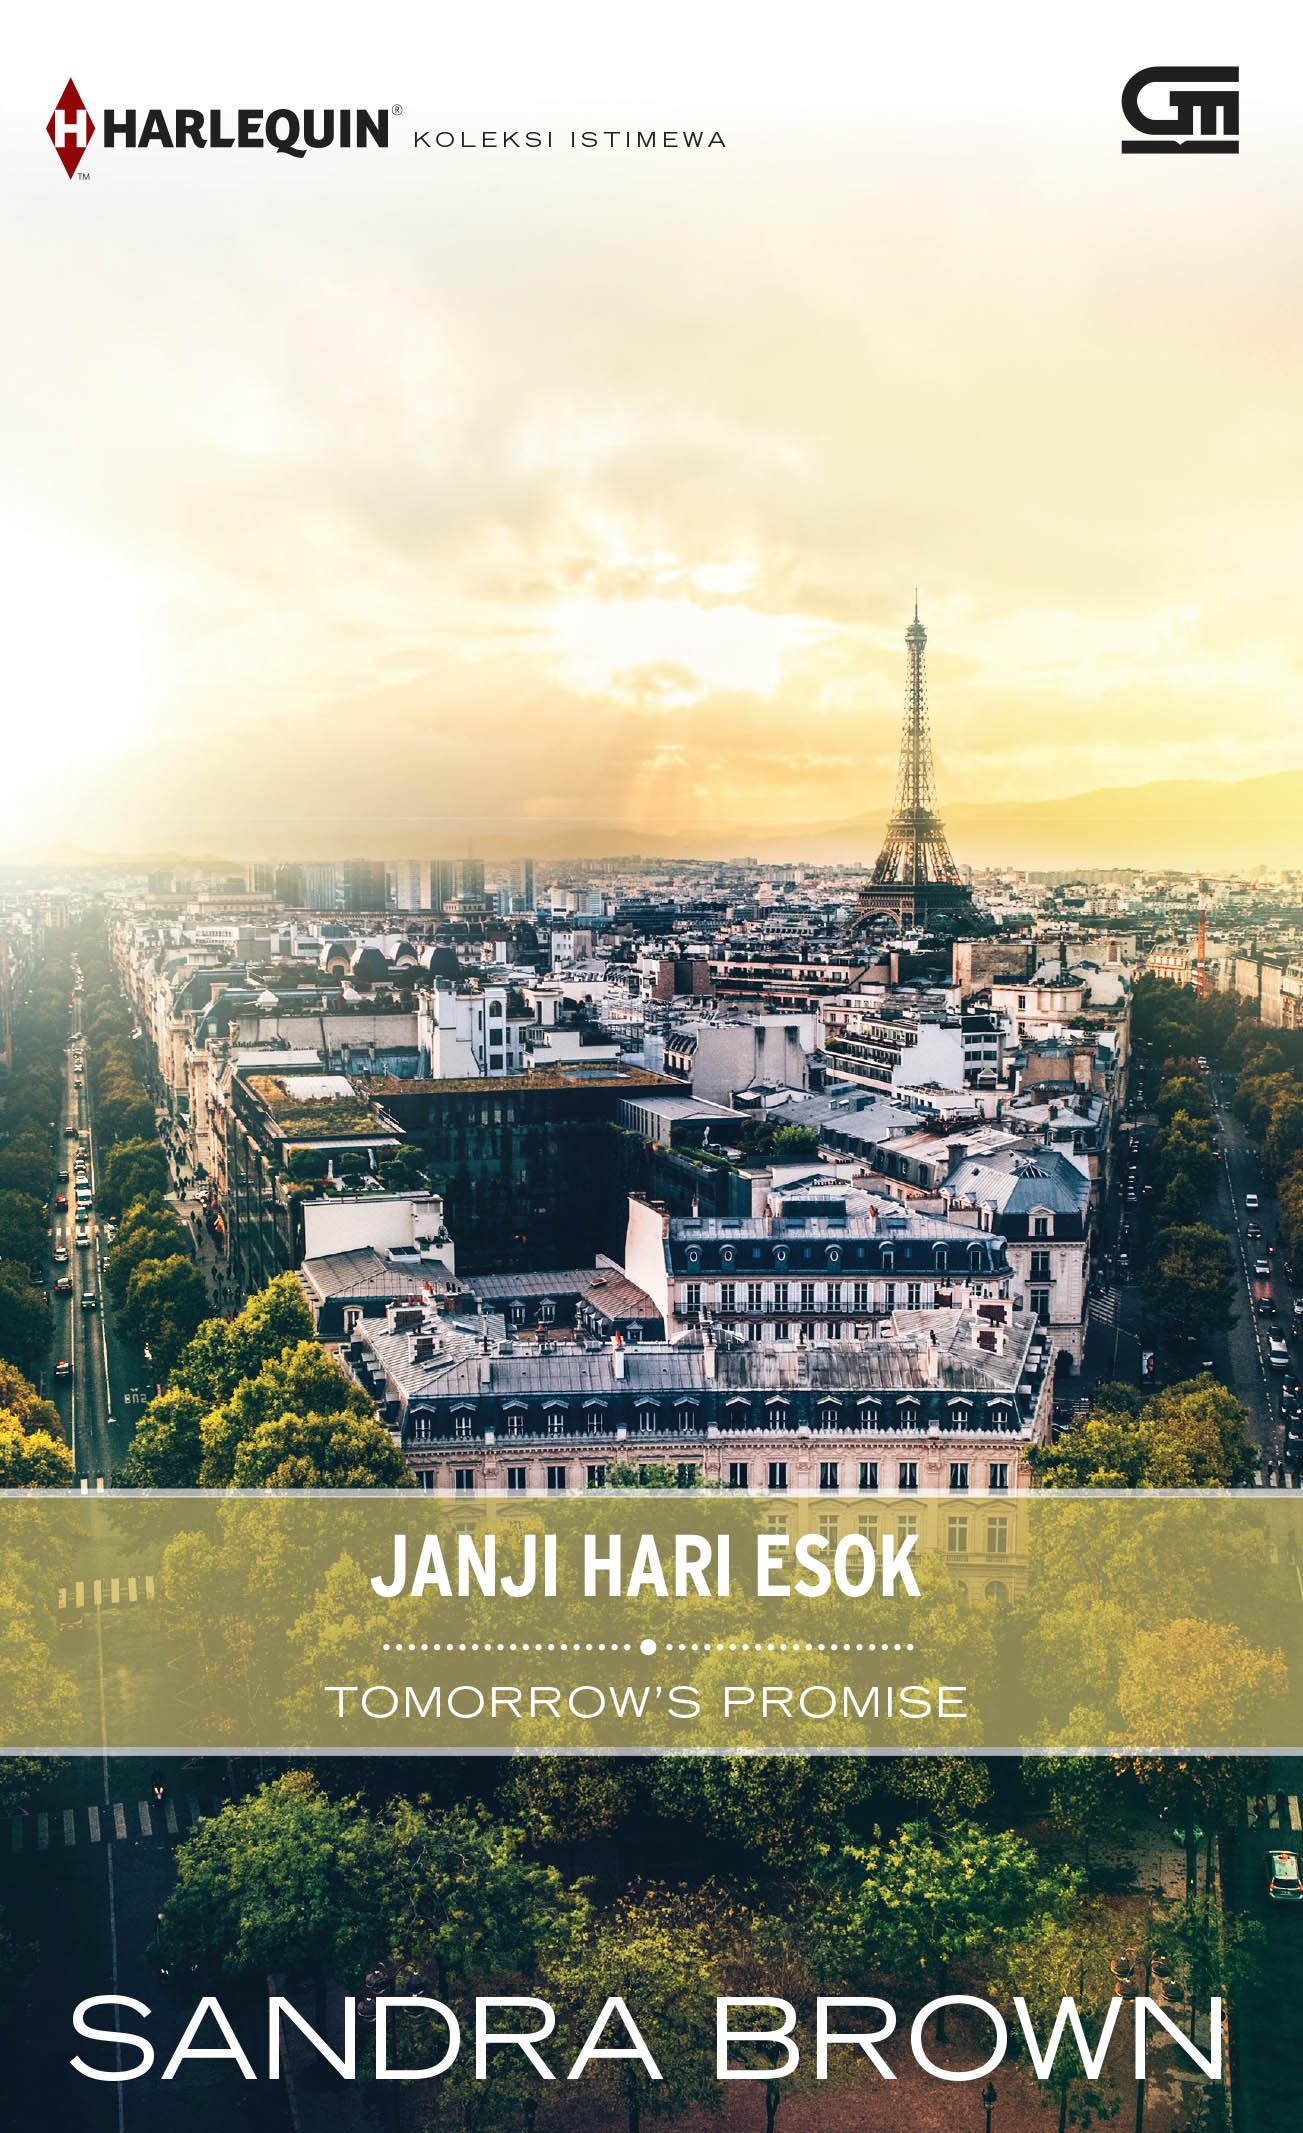 Harlequin Koleksi Istimewa: Janji Hari Esok (Tomorrow's Promise)